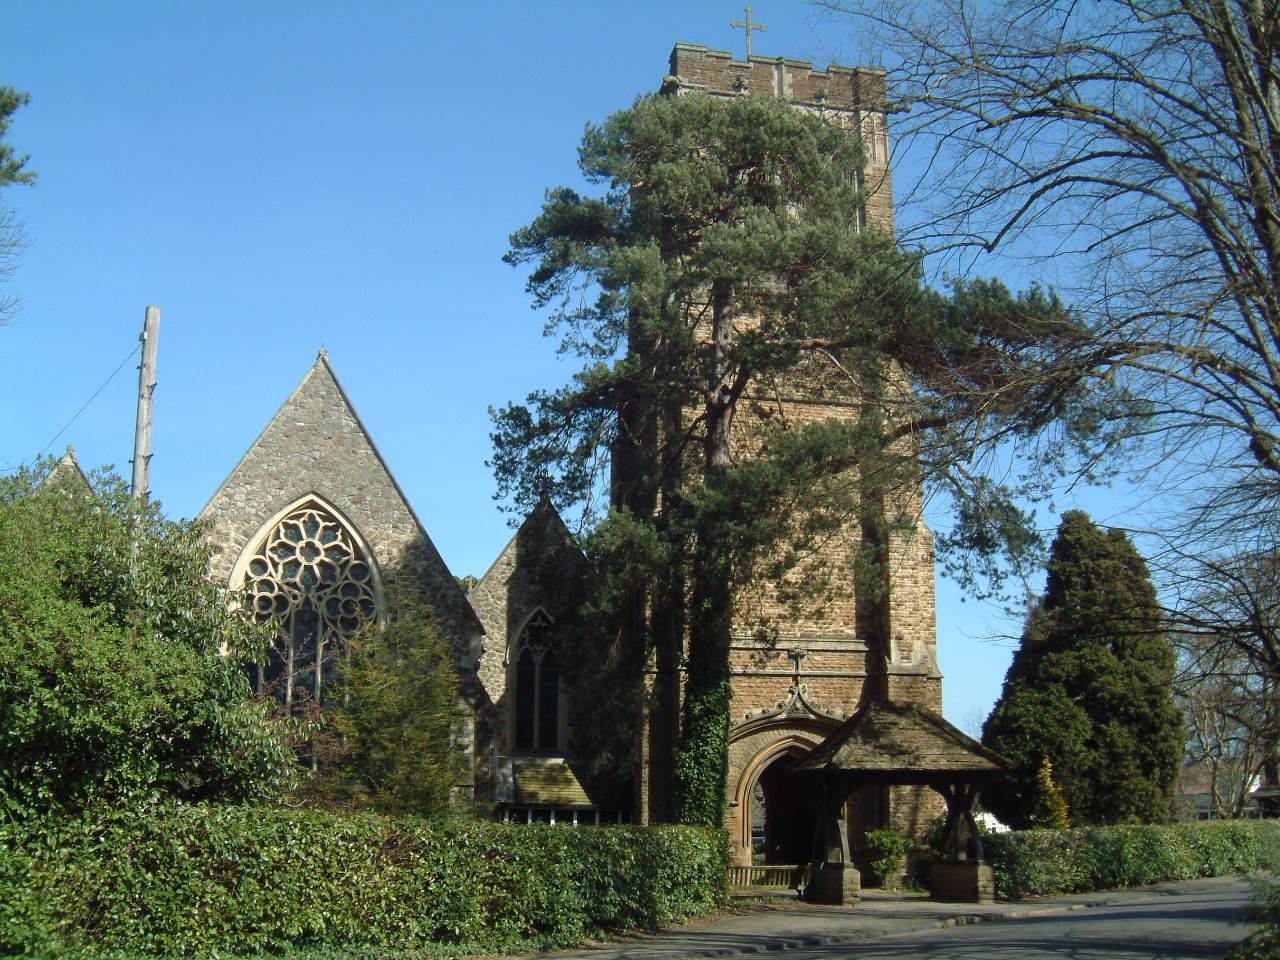 St Marys Church Oatlands Village - between Walton on Thames and Weybridge Surrey